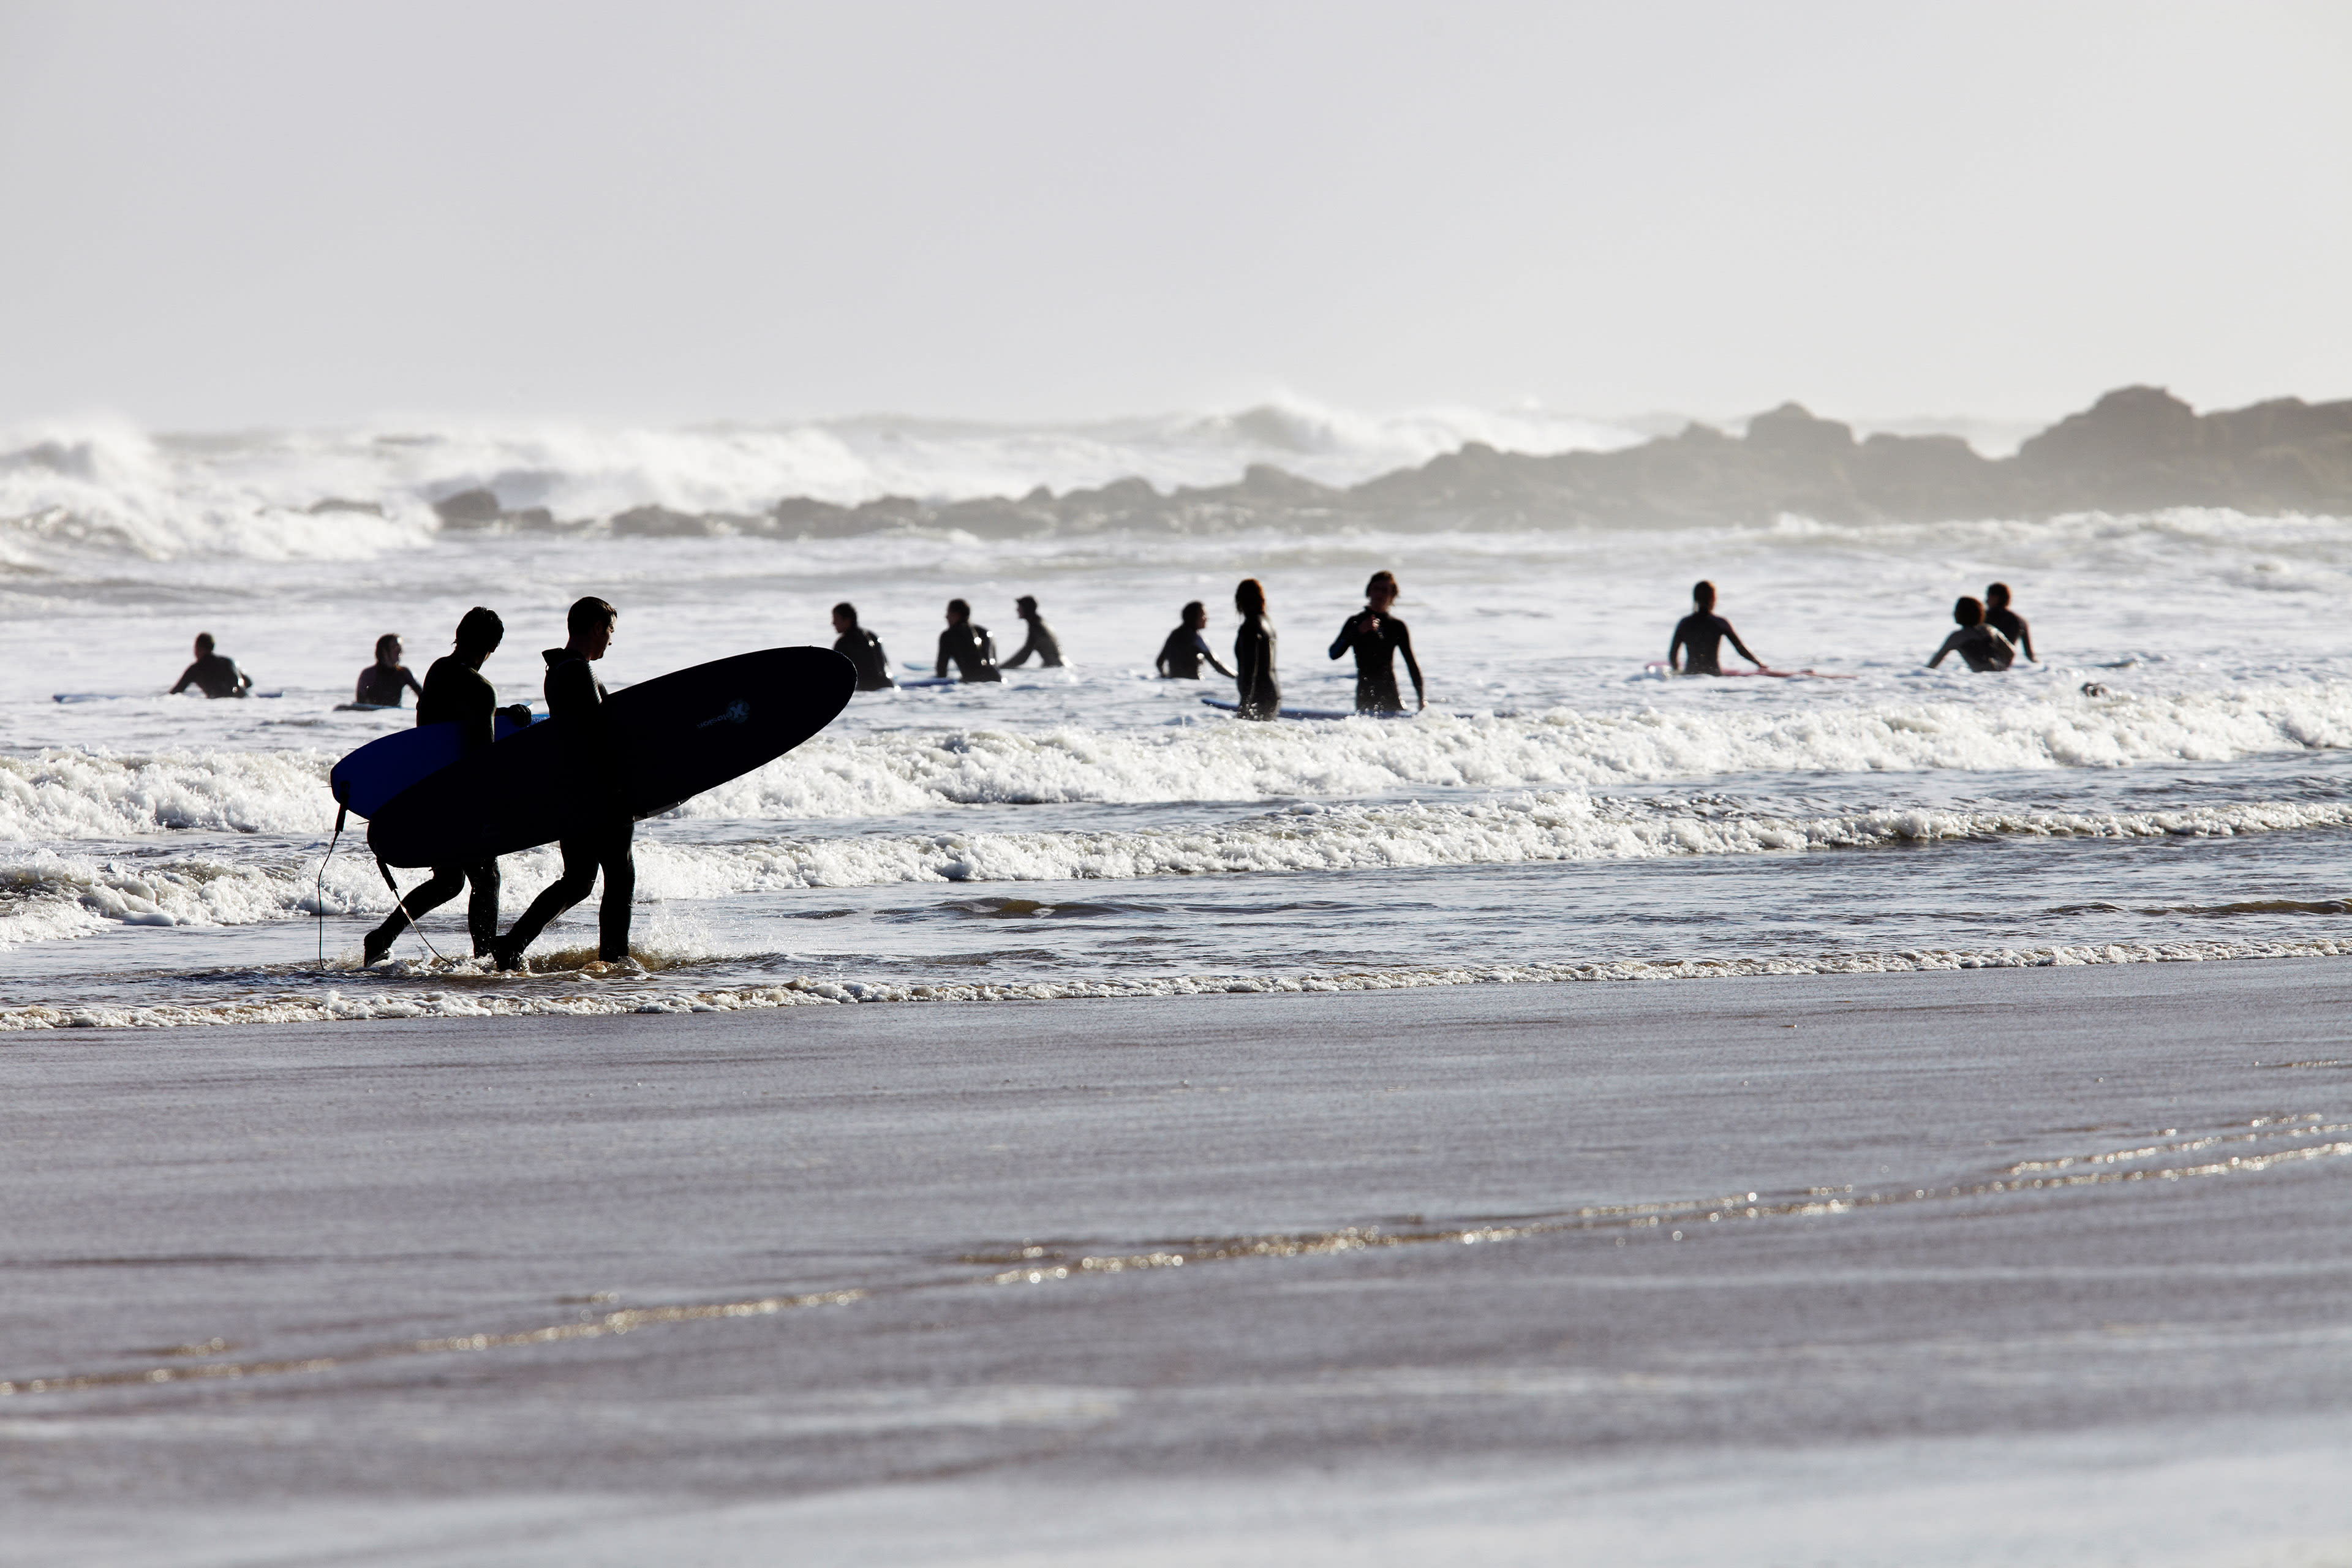 Richard Moran Beech Surf Skate Personal 001